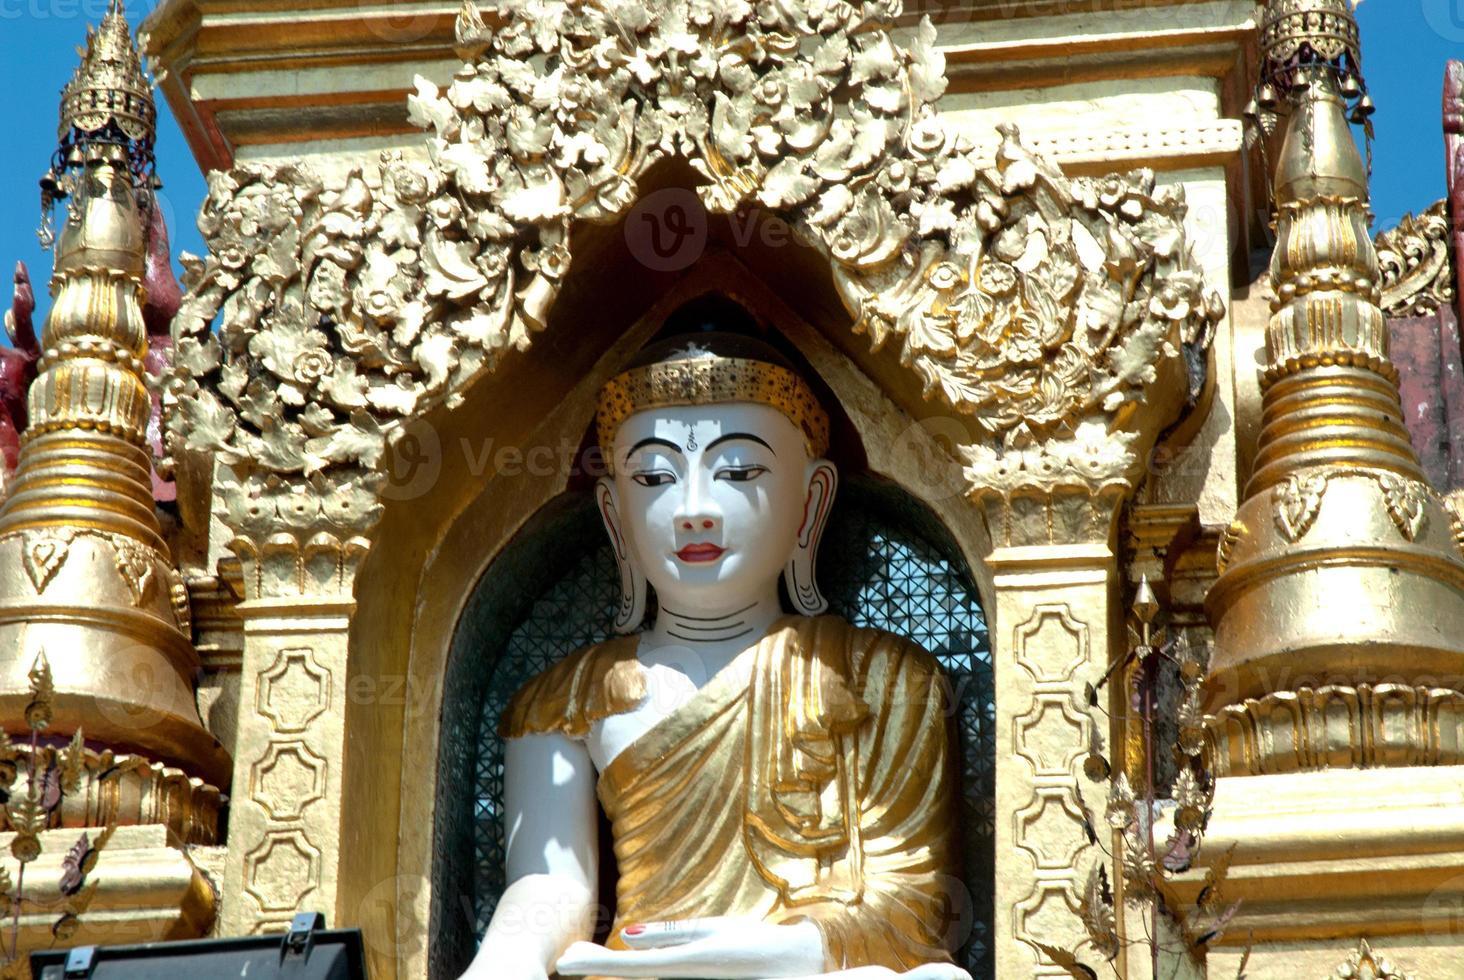 Bouddha blanc dans la pagode d'or, myanmar. photo